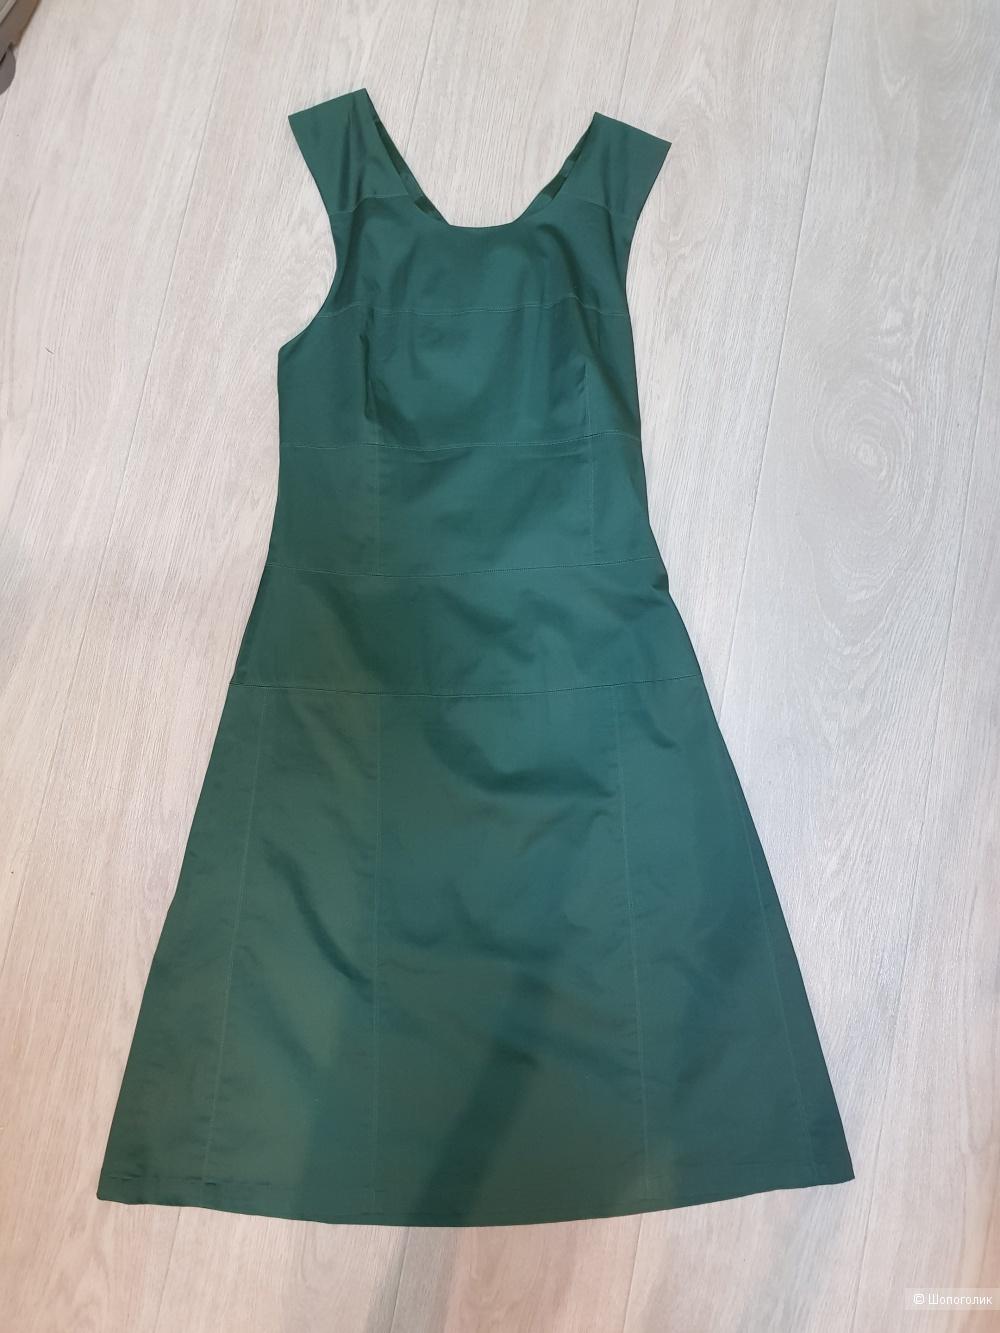 Платье-сарафан ARMANI JEANS, р.44